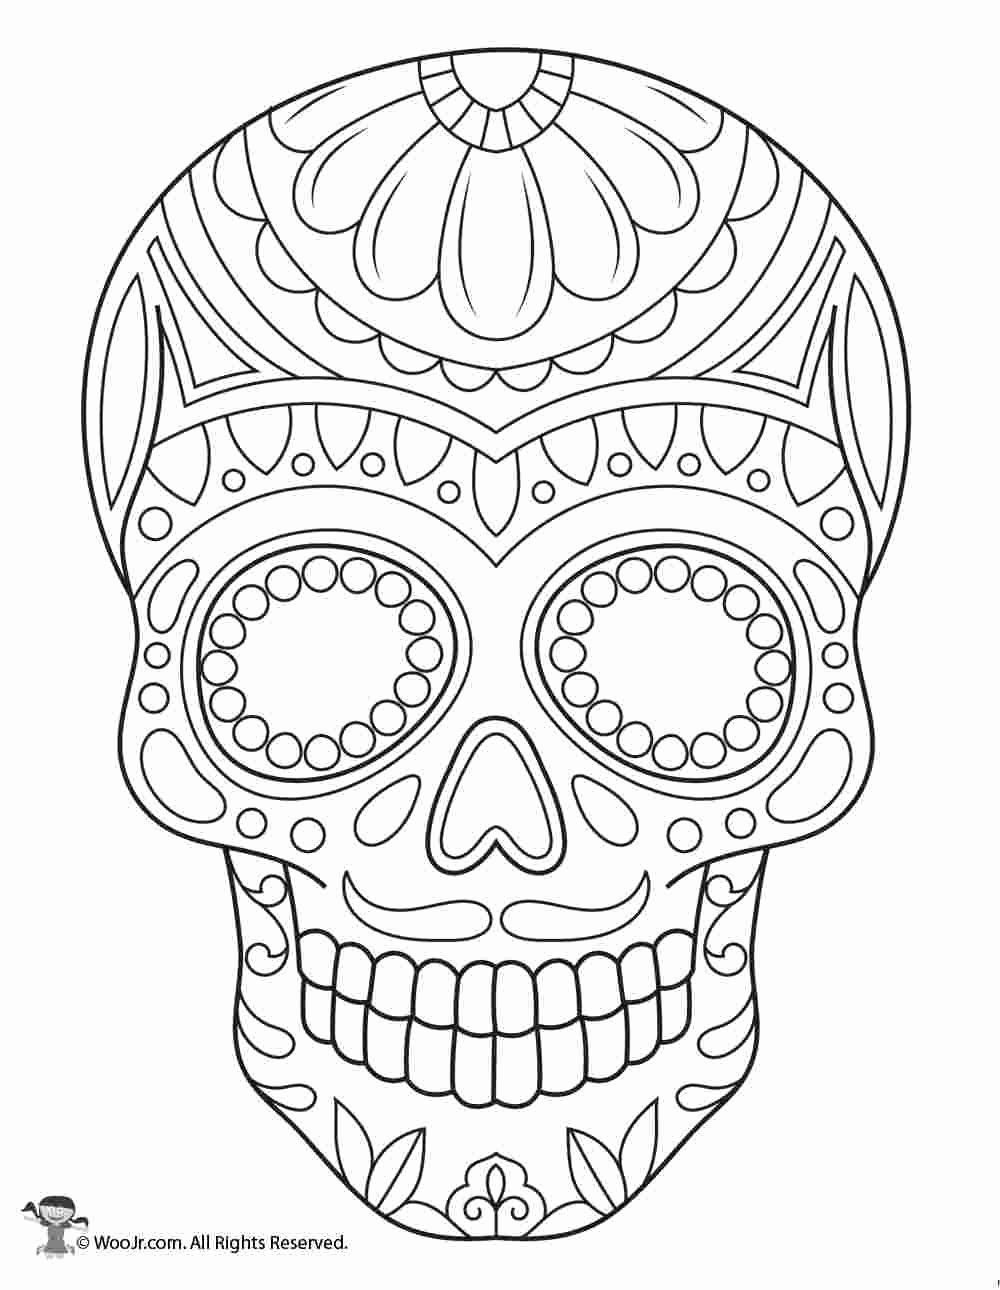 Printable Sugar Skull Coloring Pages Lovely Sugar Skull Coloring Pages Easy Simple Sugar Skull Skull Coloring Pages Sugar Skull Art Drawing Sugar Skull Artwork